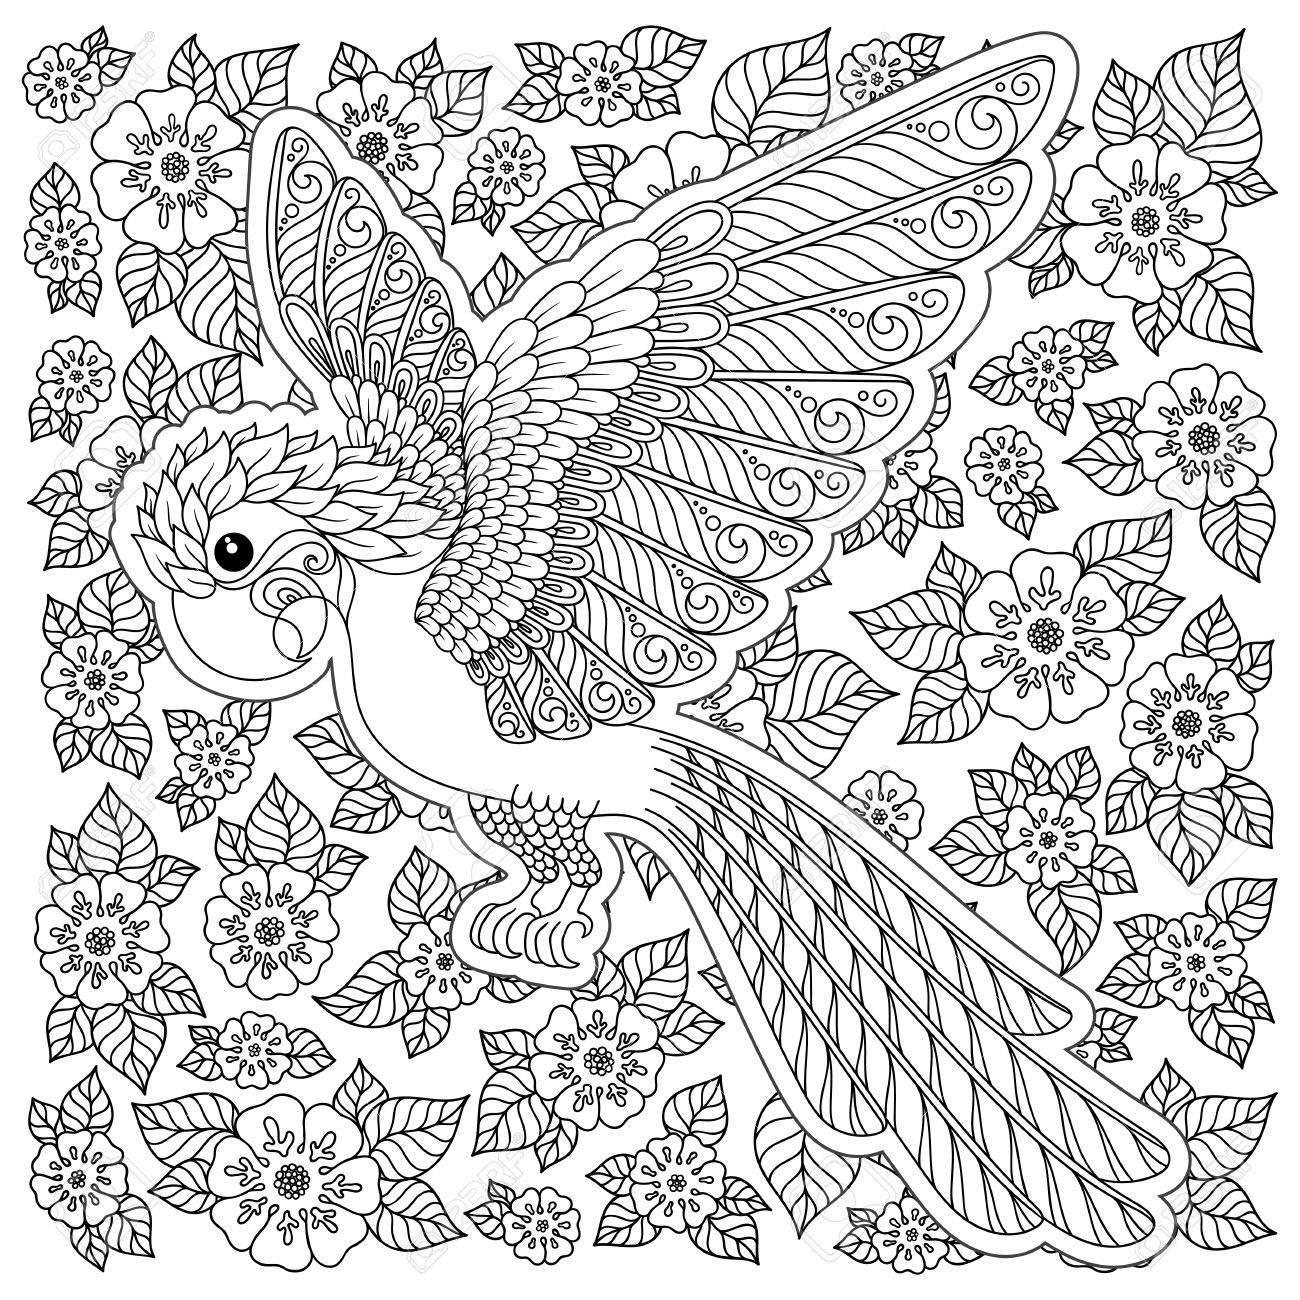 Pájaro Exótico Flores Fantásticas Ramas Hojas Dibujo De Líneas Finas De Contorno Fantasía De Vector Estilizada Cacatúa Selva Loro Silueta